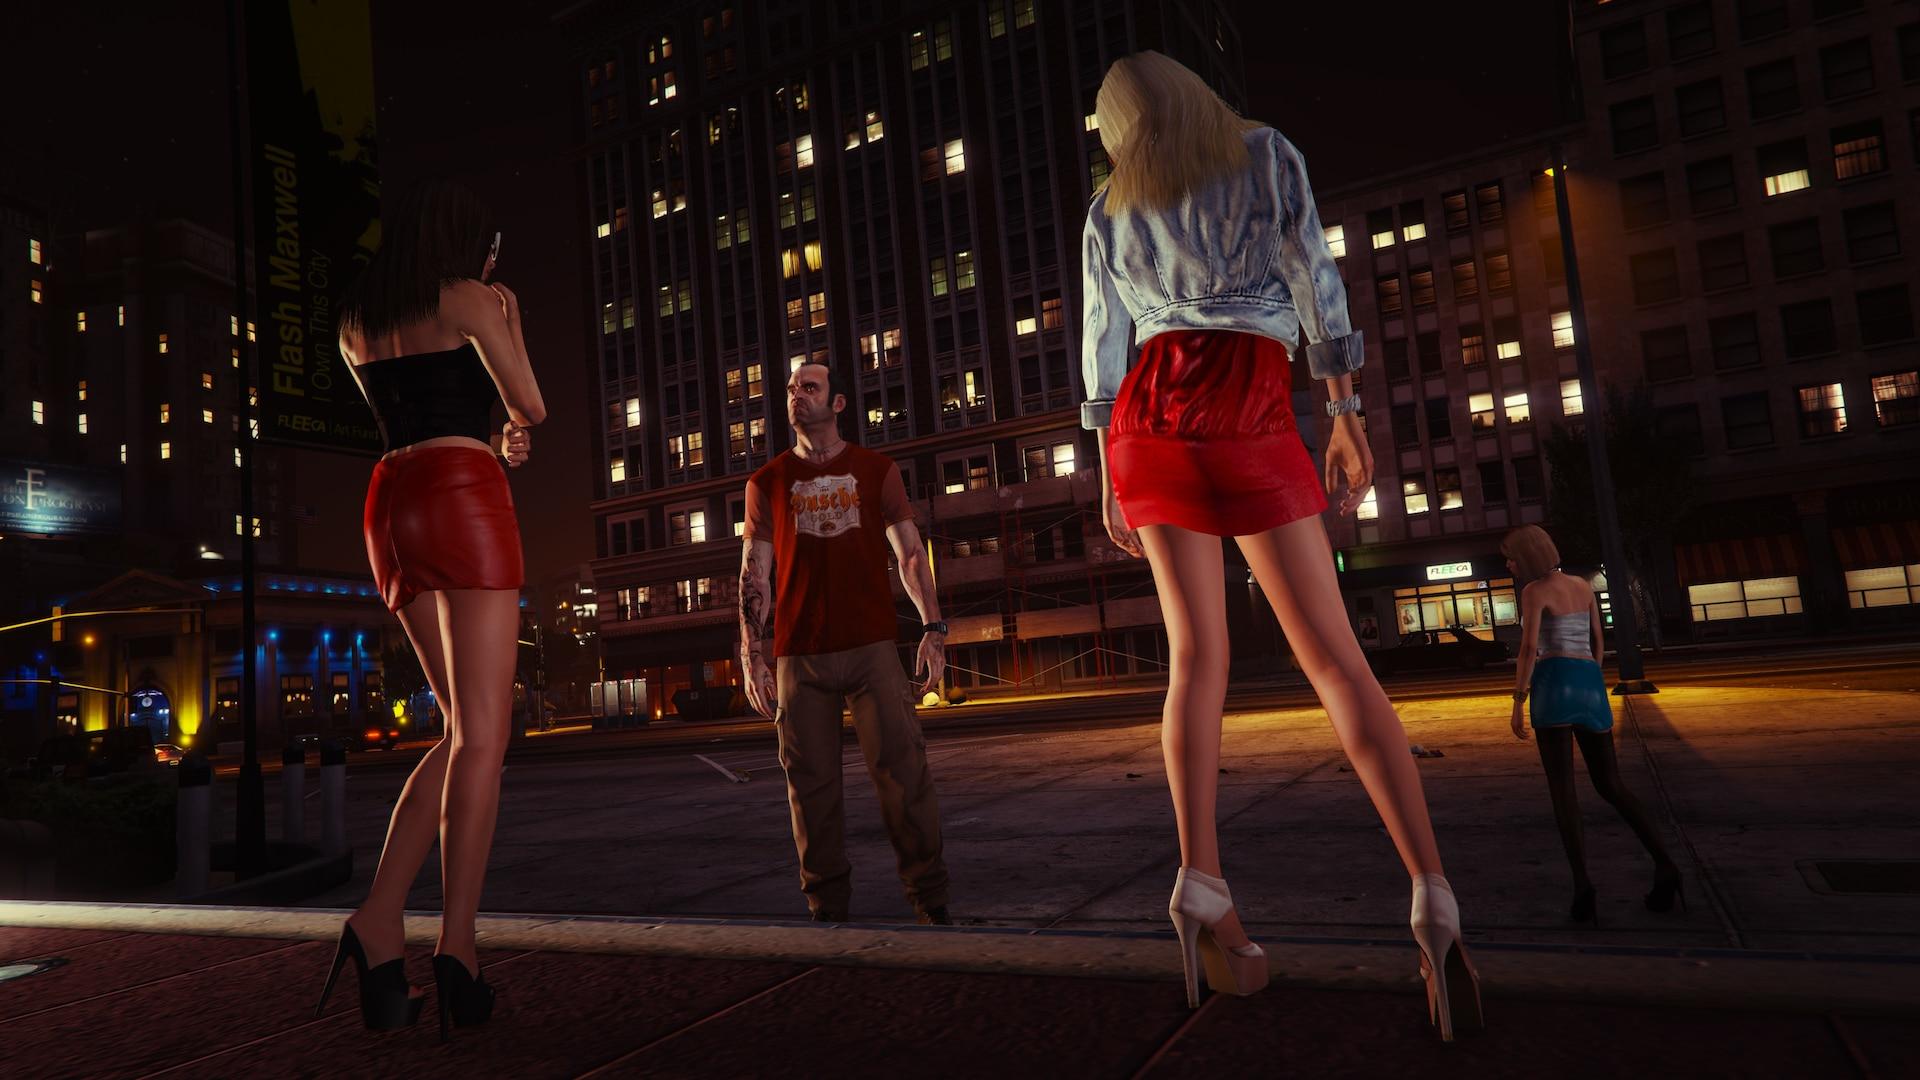 vjkjlk.jpg - Grand Theft Auto 5